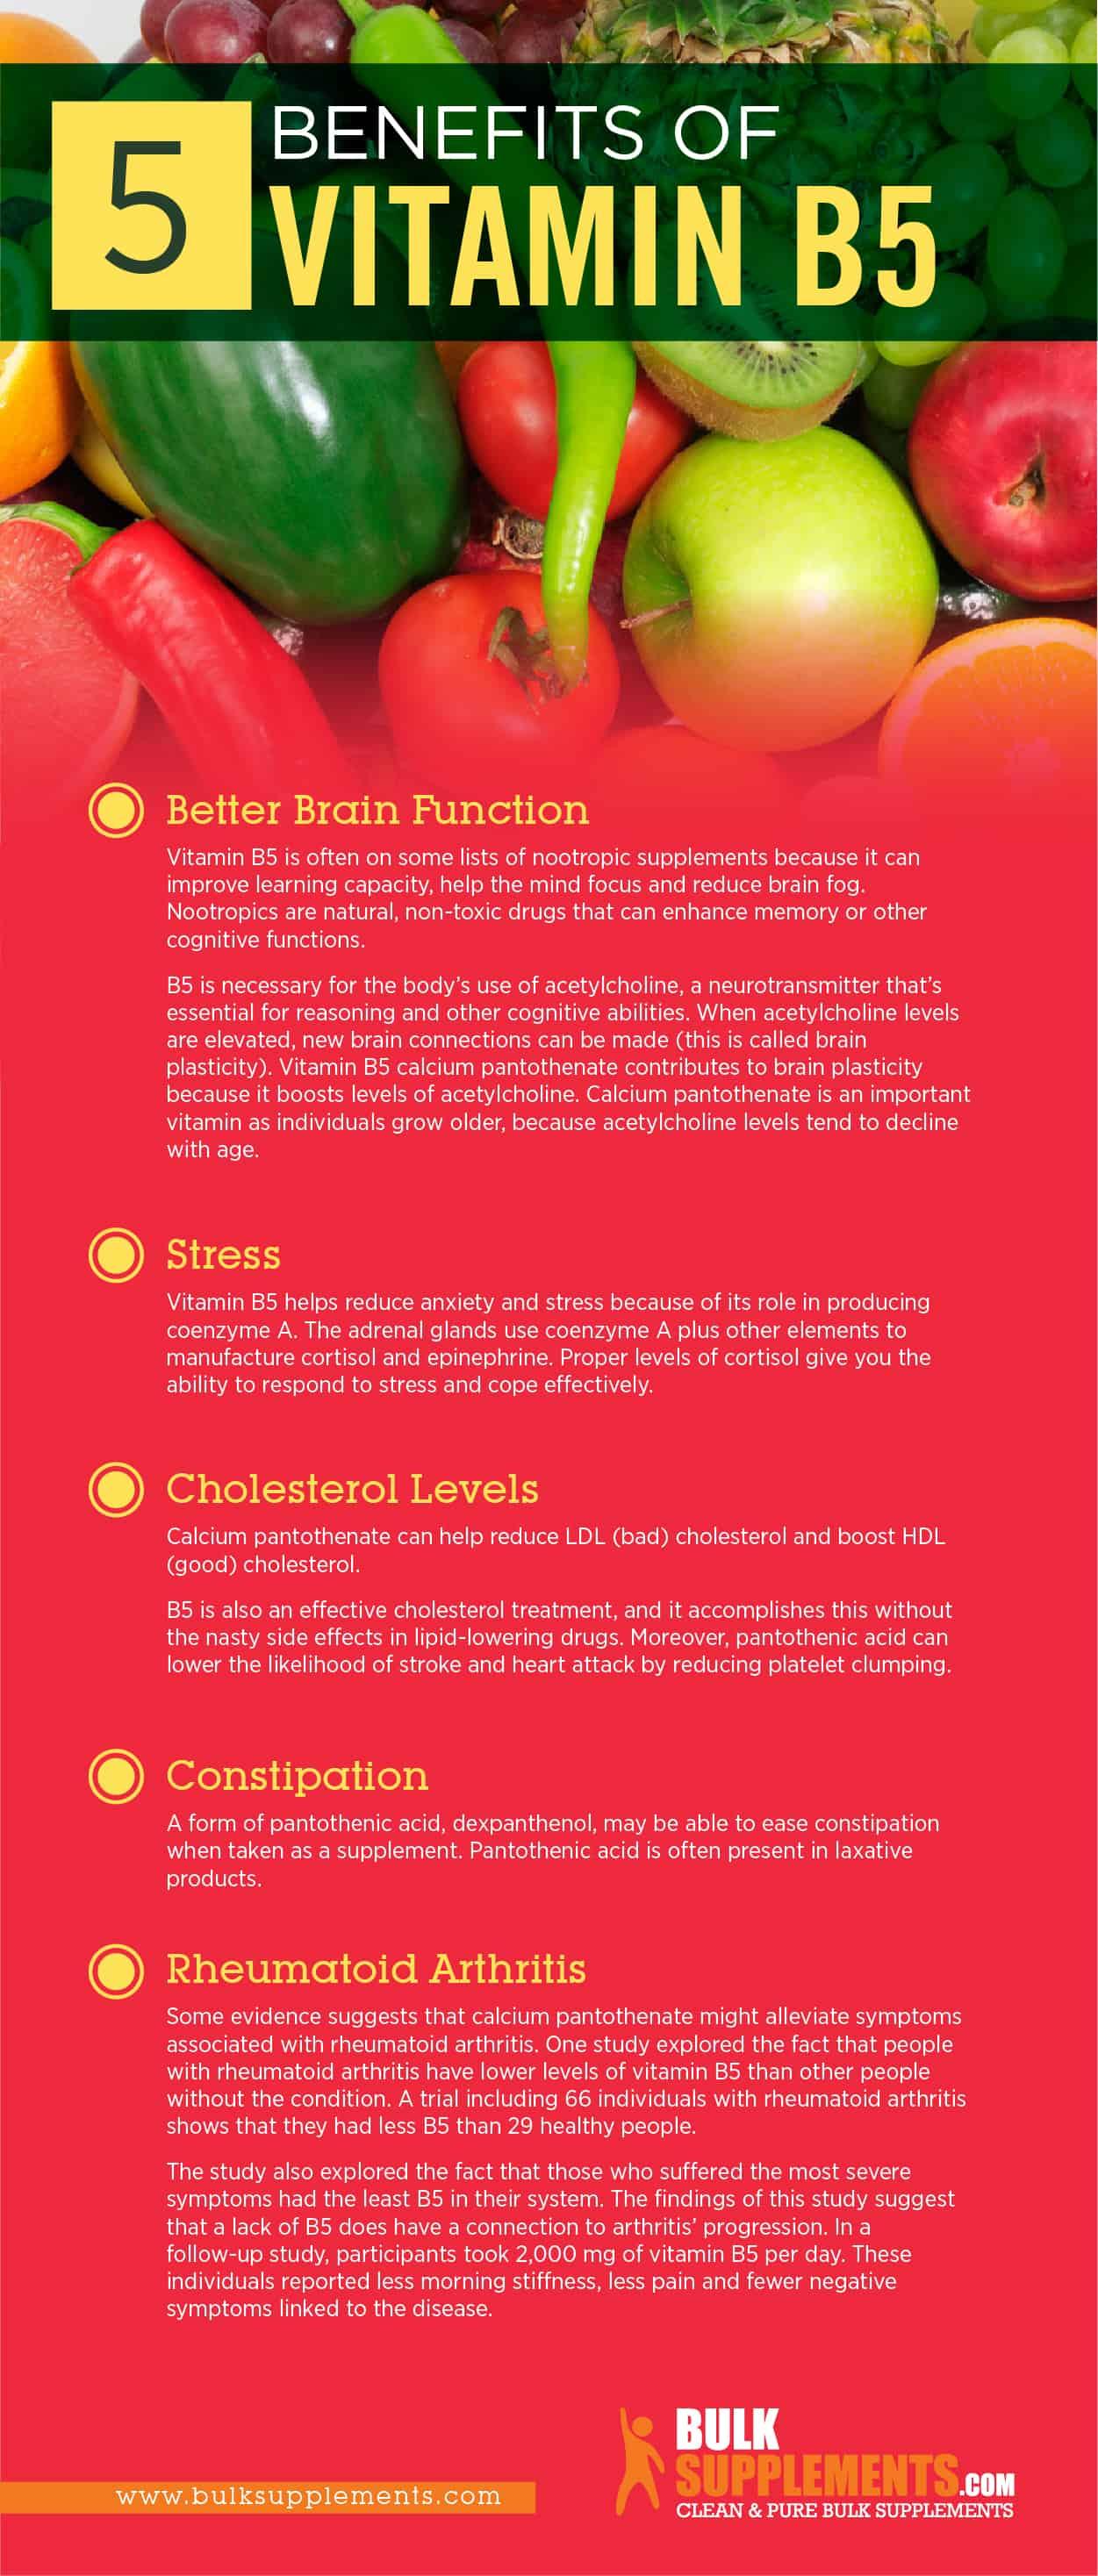 Vitamin B5 Benefits